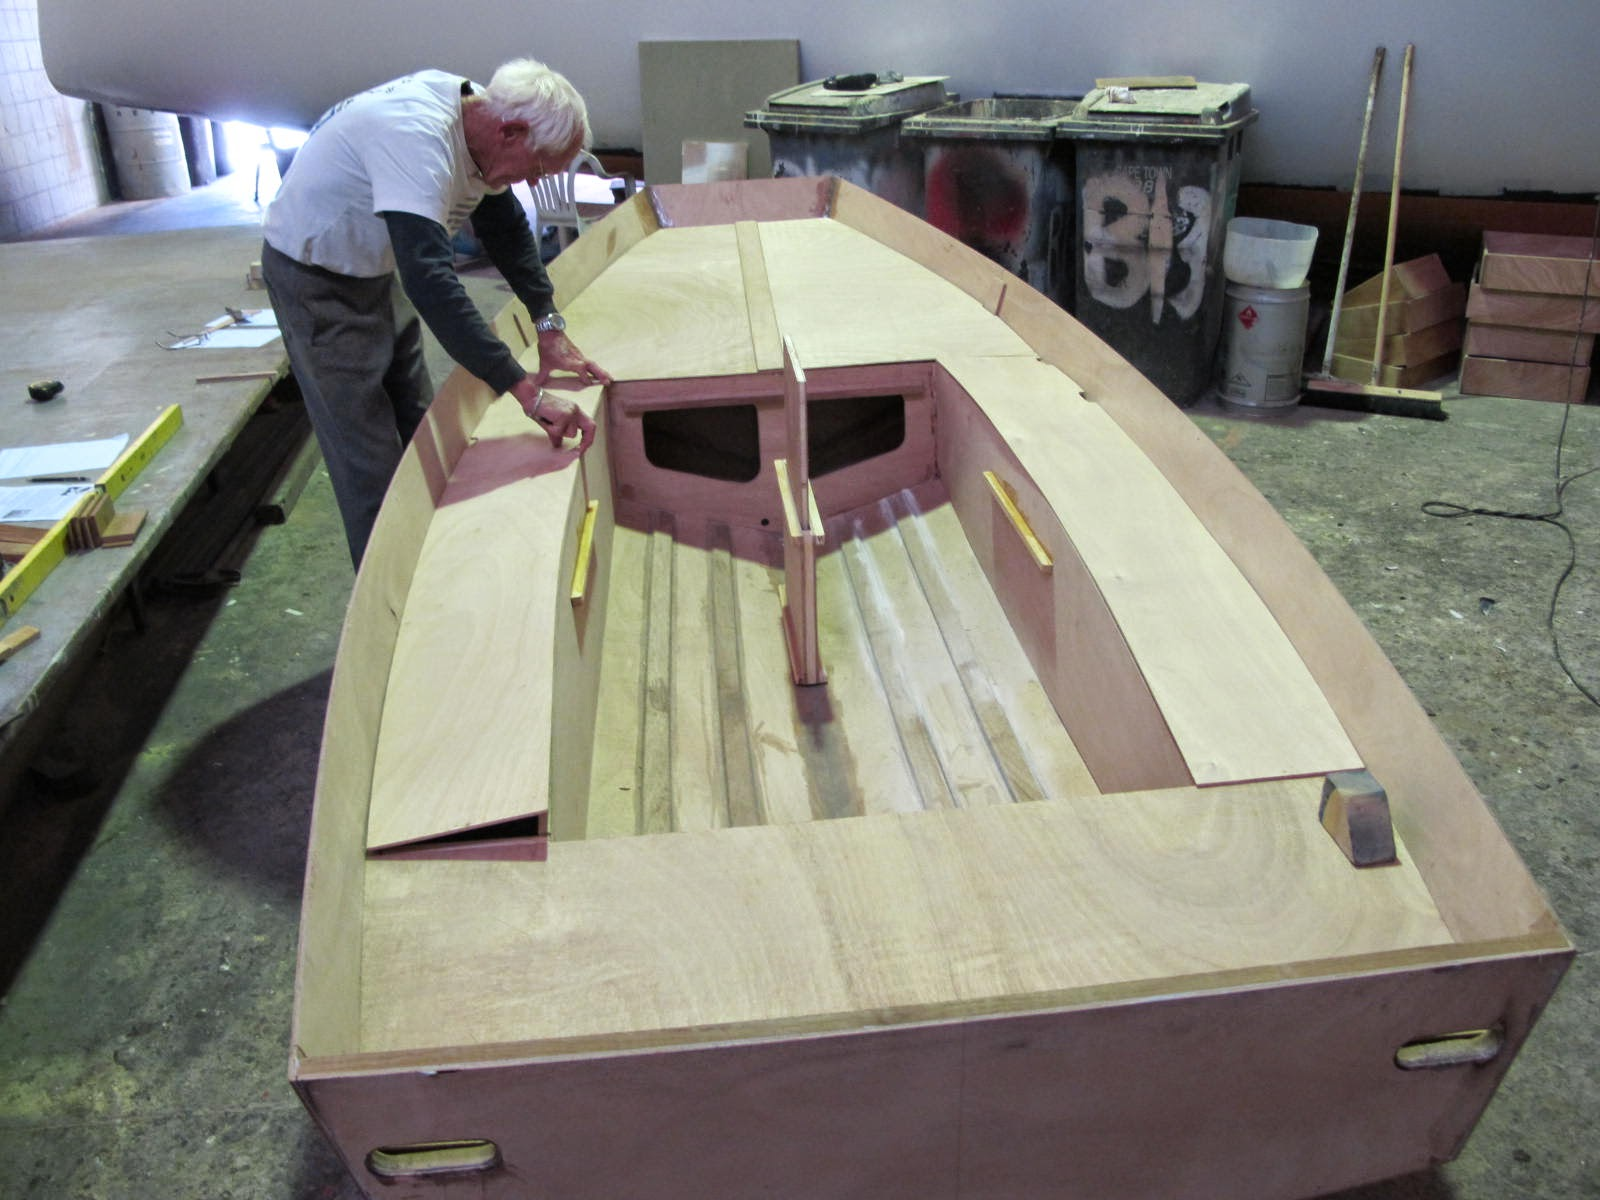 Cnc Plywood Boat Kits | Wooden Thing